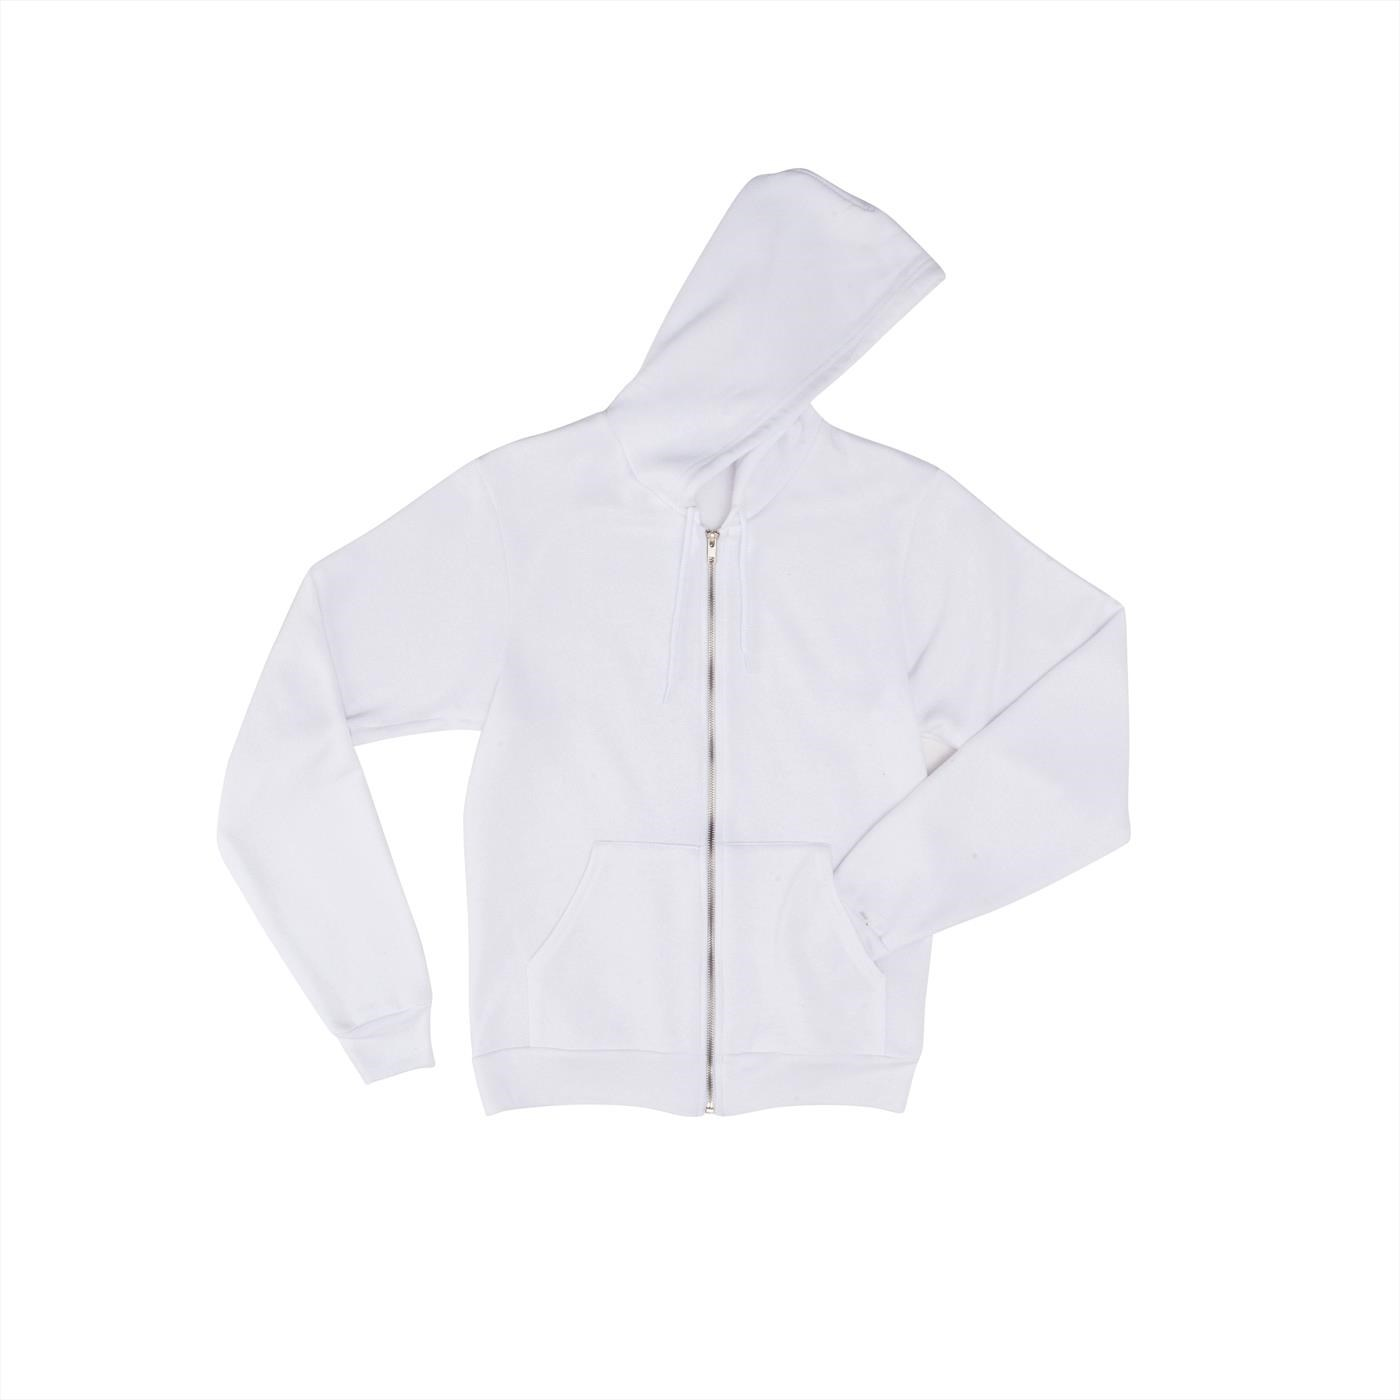 American Apparel F497 Flex Fleece Zip Hoodie M 1 Dark Heather Grey 1 Slate